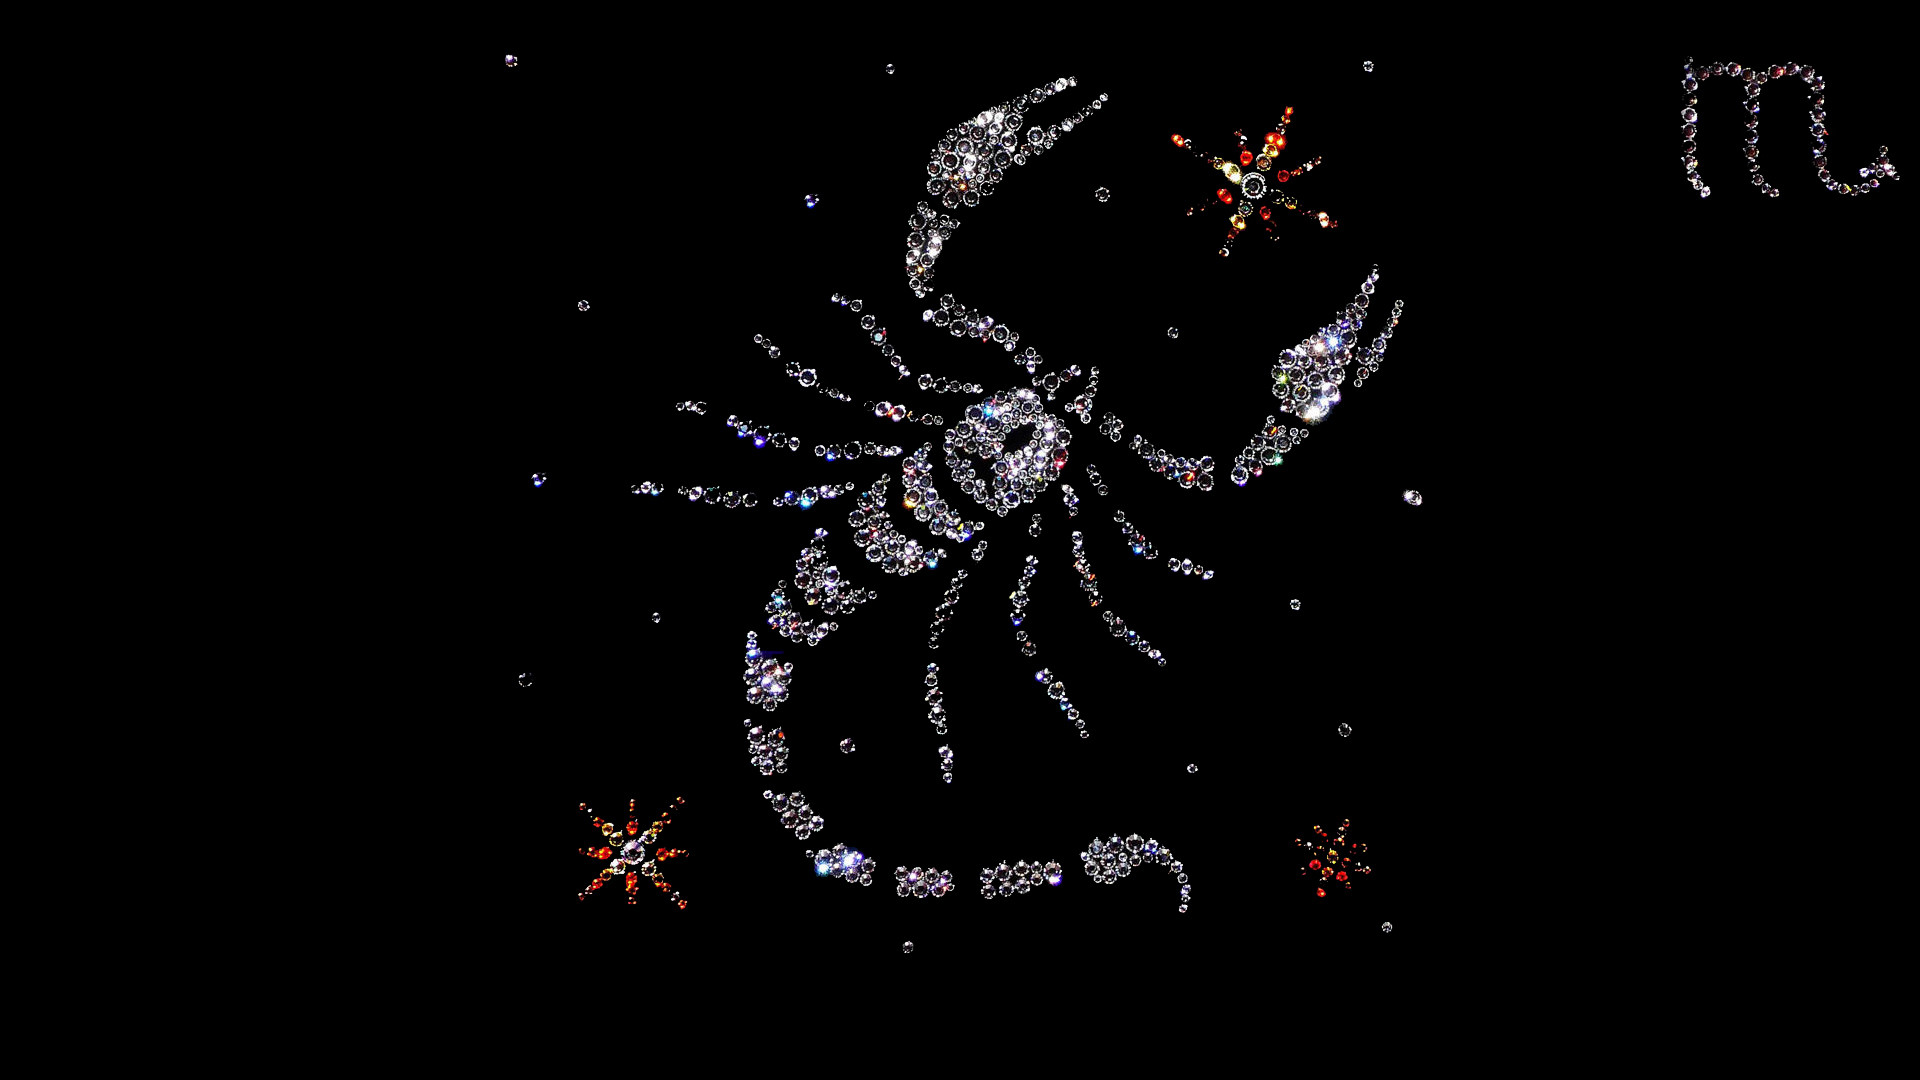 1920x1080 Mortal Kombat 9 Scorpion Wallpaper : Mortal Kombat Wallpapers Hd ..